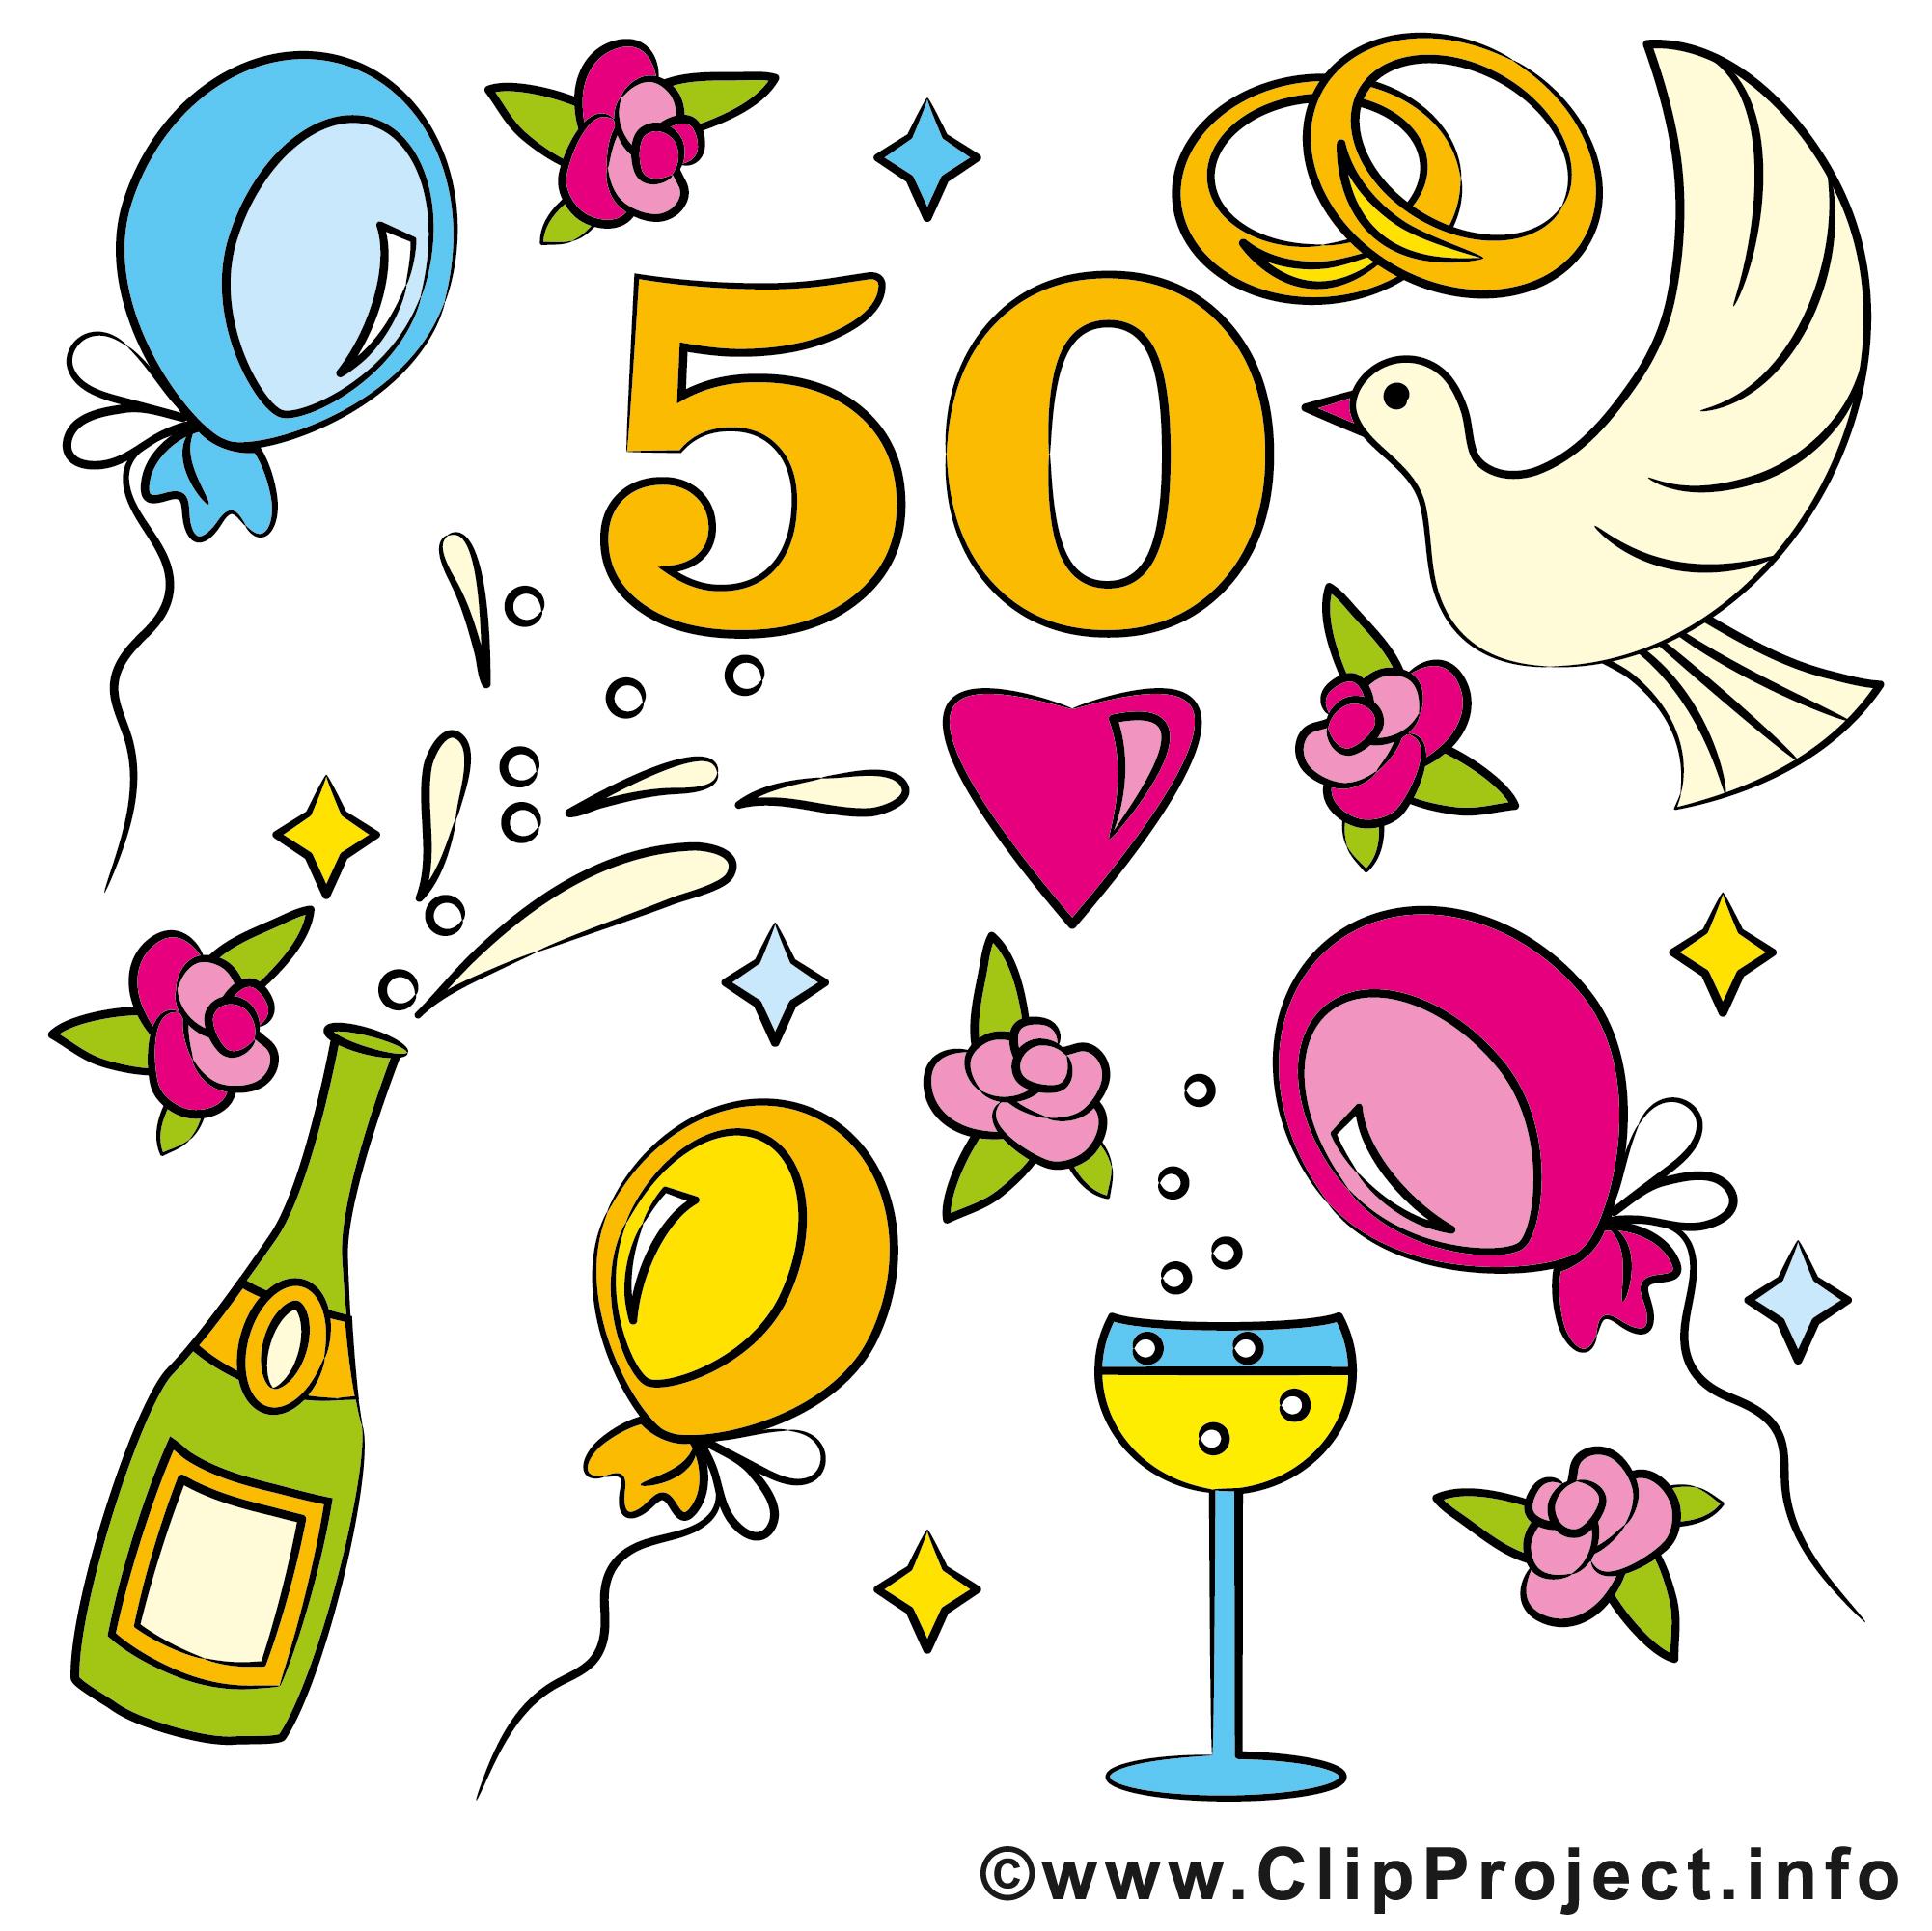 Clipart 50 geburtstag einladung png transparent Clipart 50. geburtstag einladung - ClipartFest png transparent